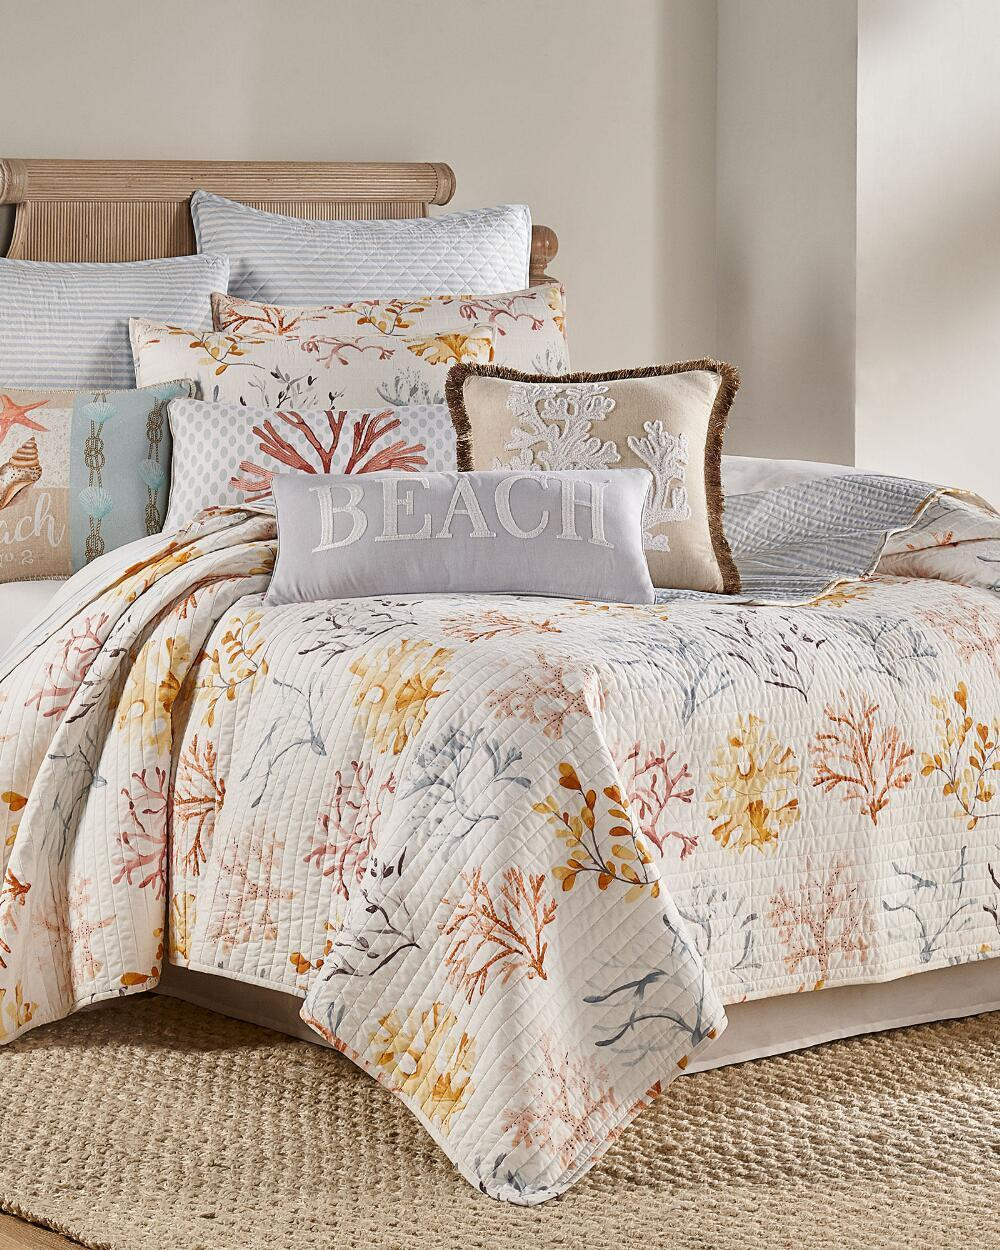 Luxury Bedding Soft Cozy White Blue Coral Yellow Coastal ...